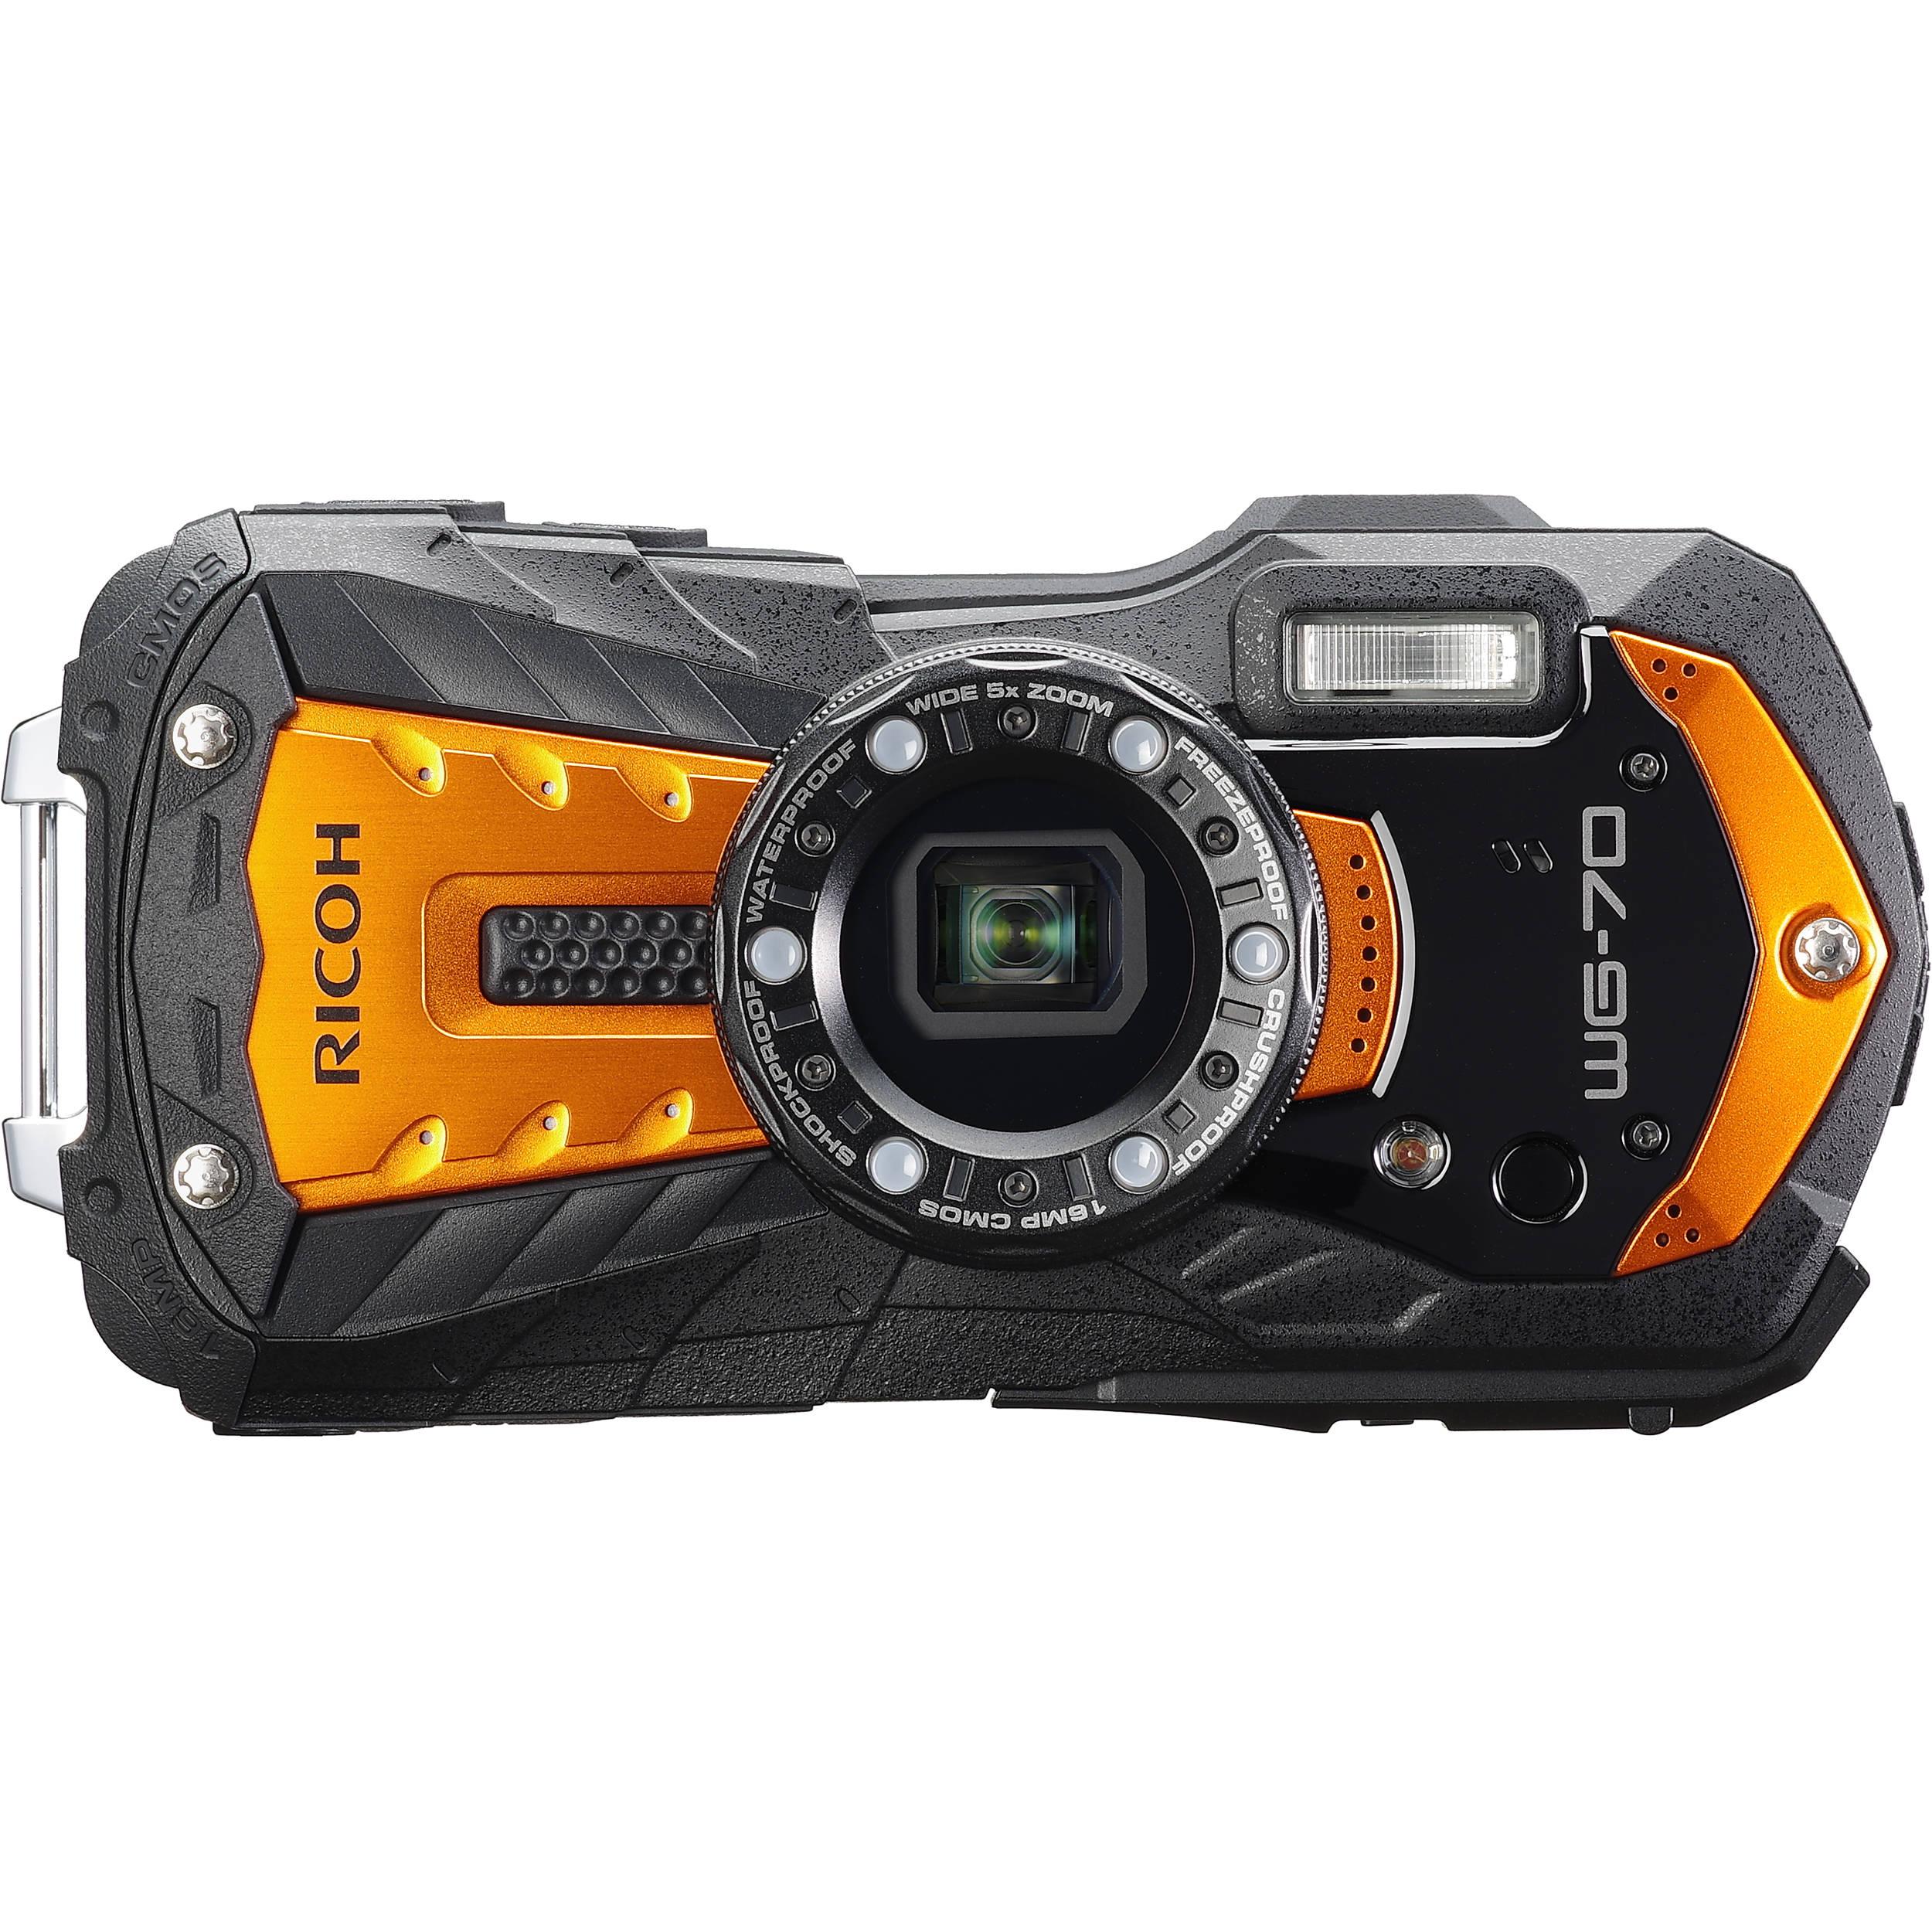 Floating Wrist Strap for Digital Cameras Bright Orange for High Visiablity x 2